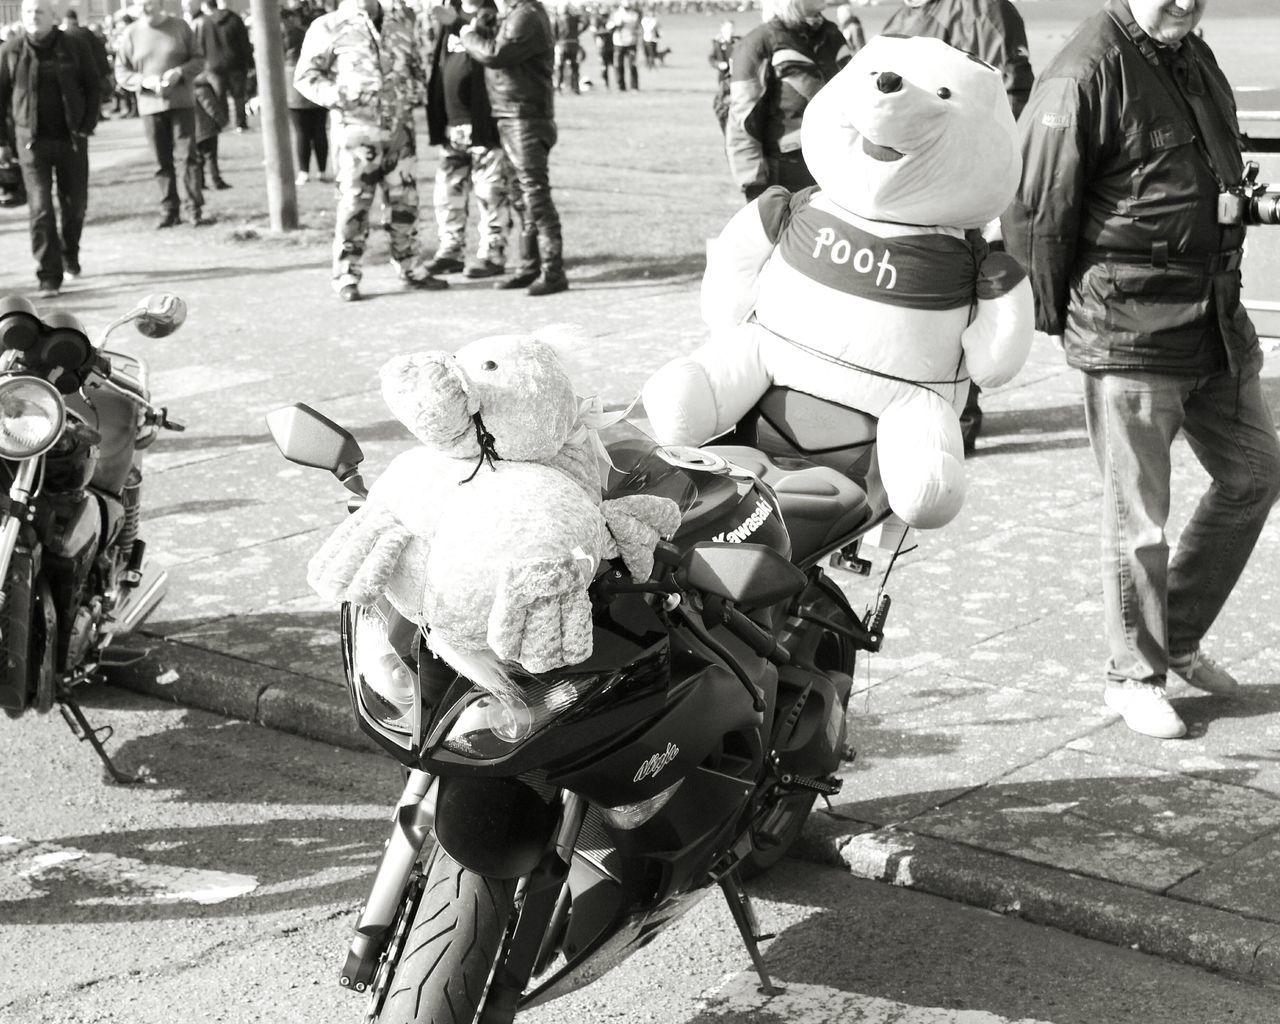 Hanging Out Canon EOS 600D DSLR Egg Run New Brighton Motorbikes Messing Around Enjoying Life Wirral